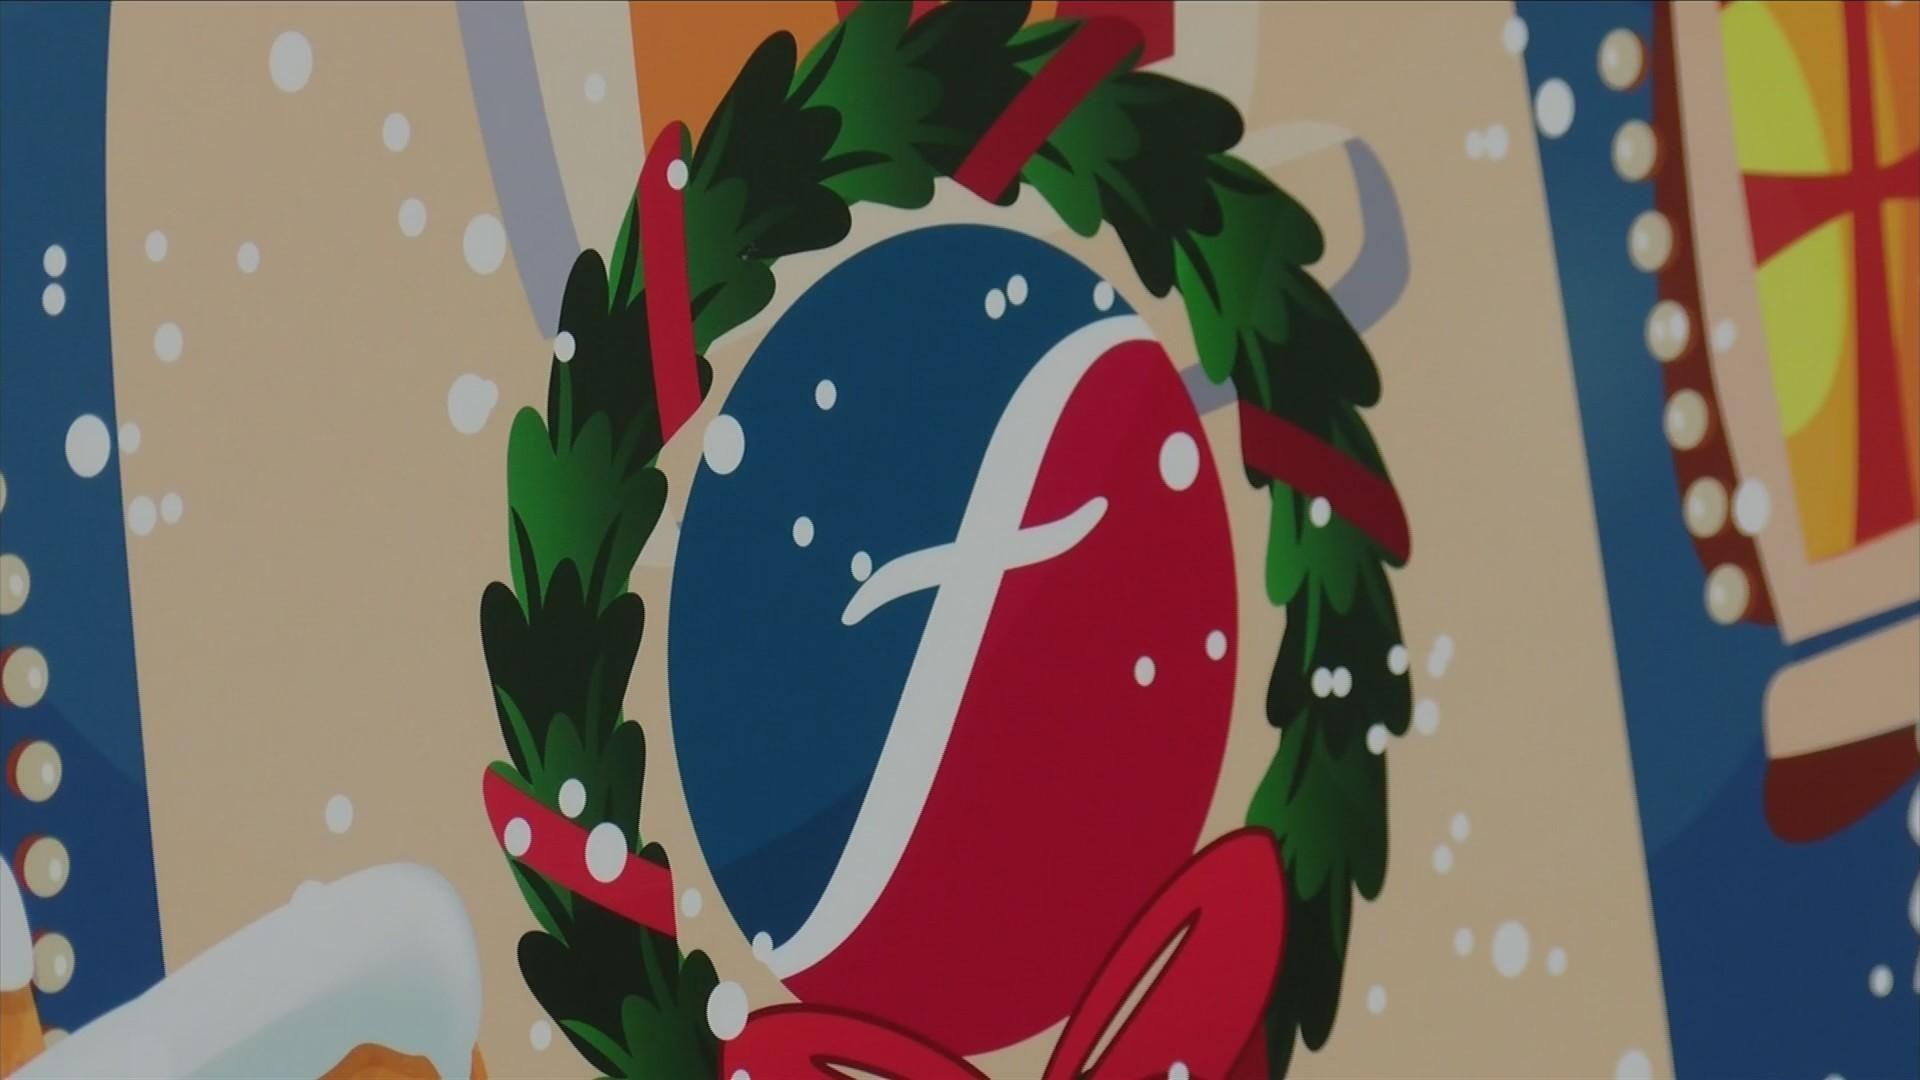 Republic Christmas Parade 2020 2020 Joplin Christmas Parade theme announced   KSNF/KODE